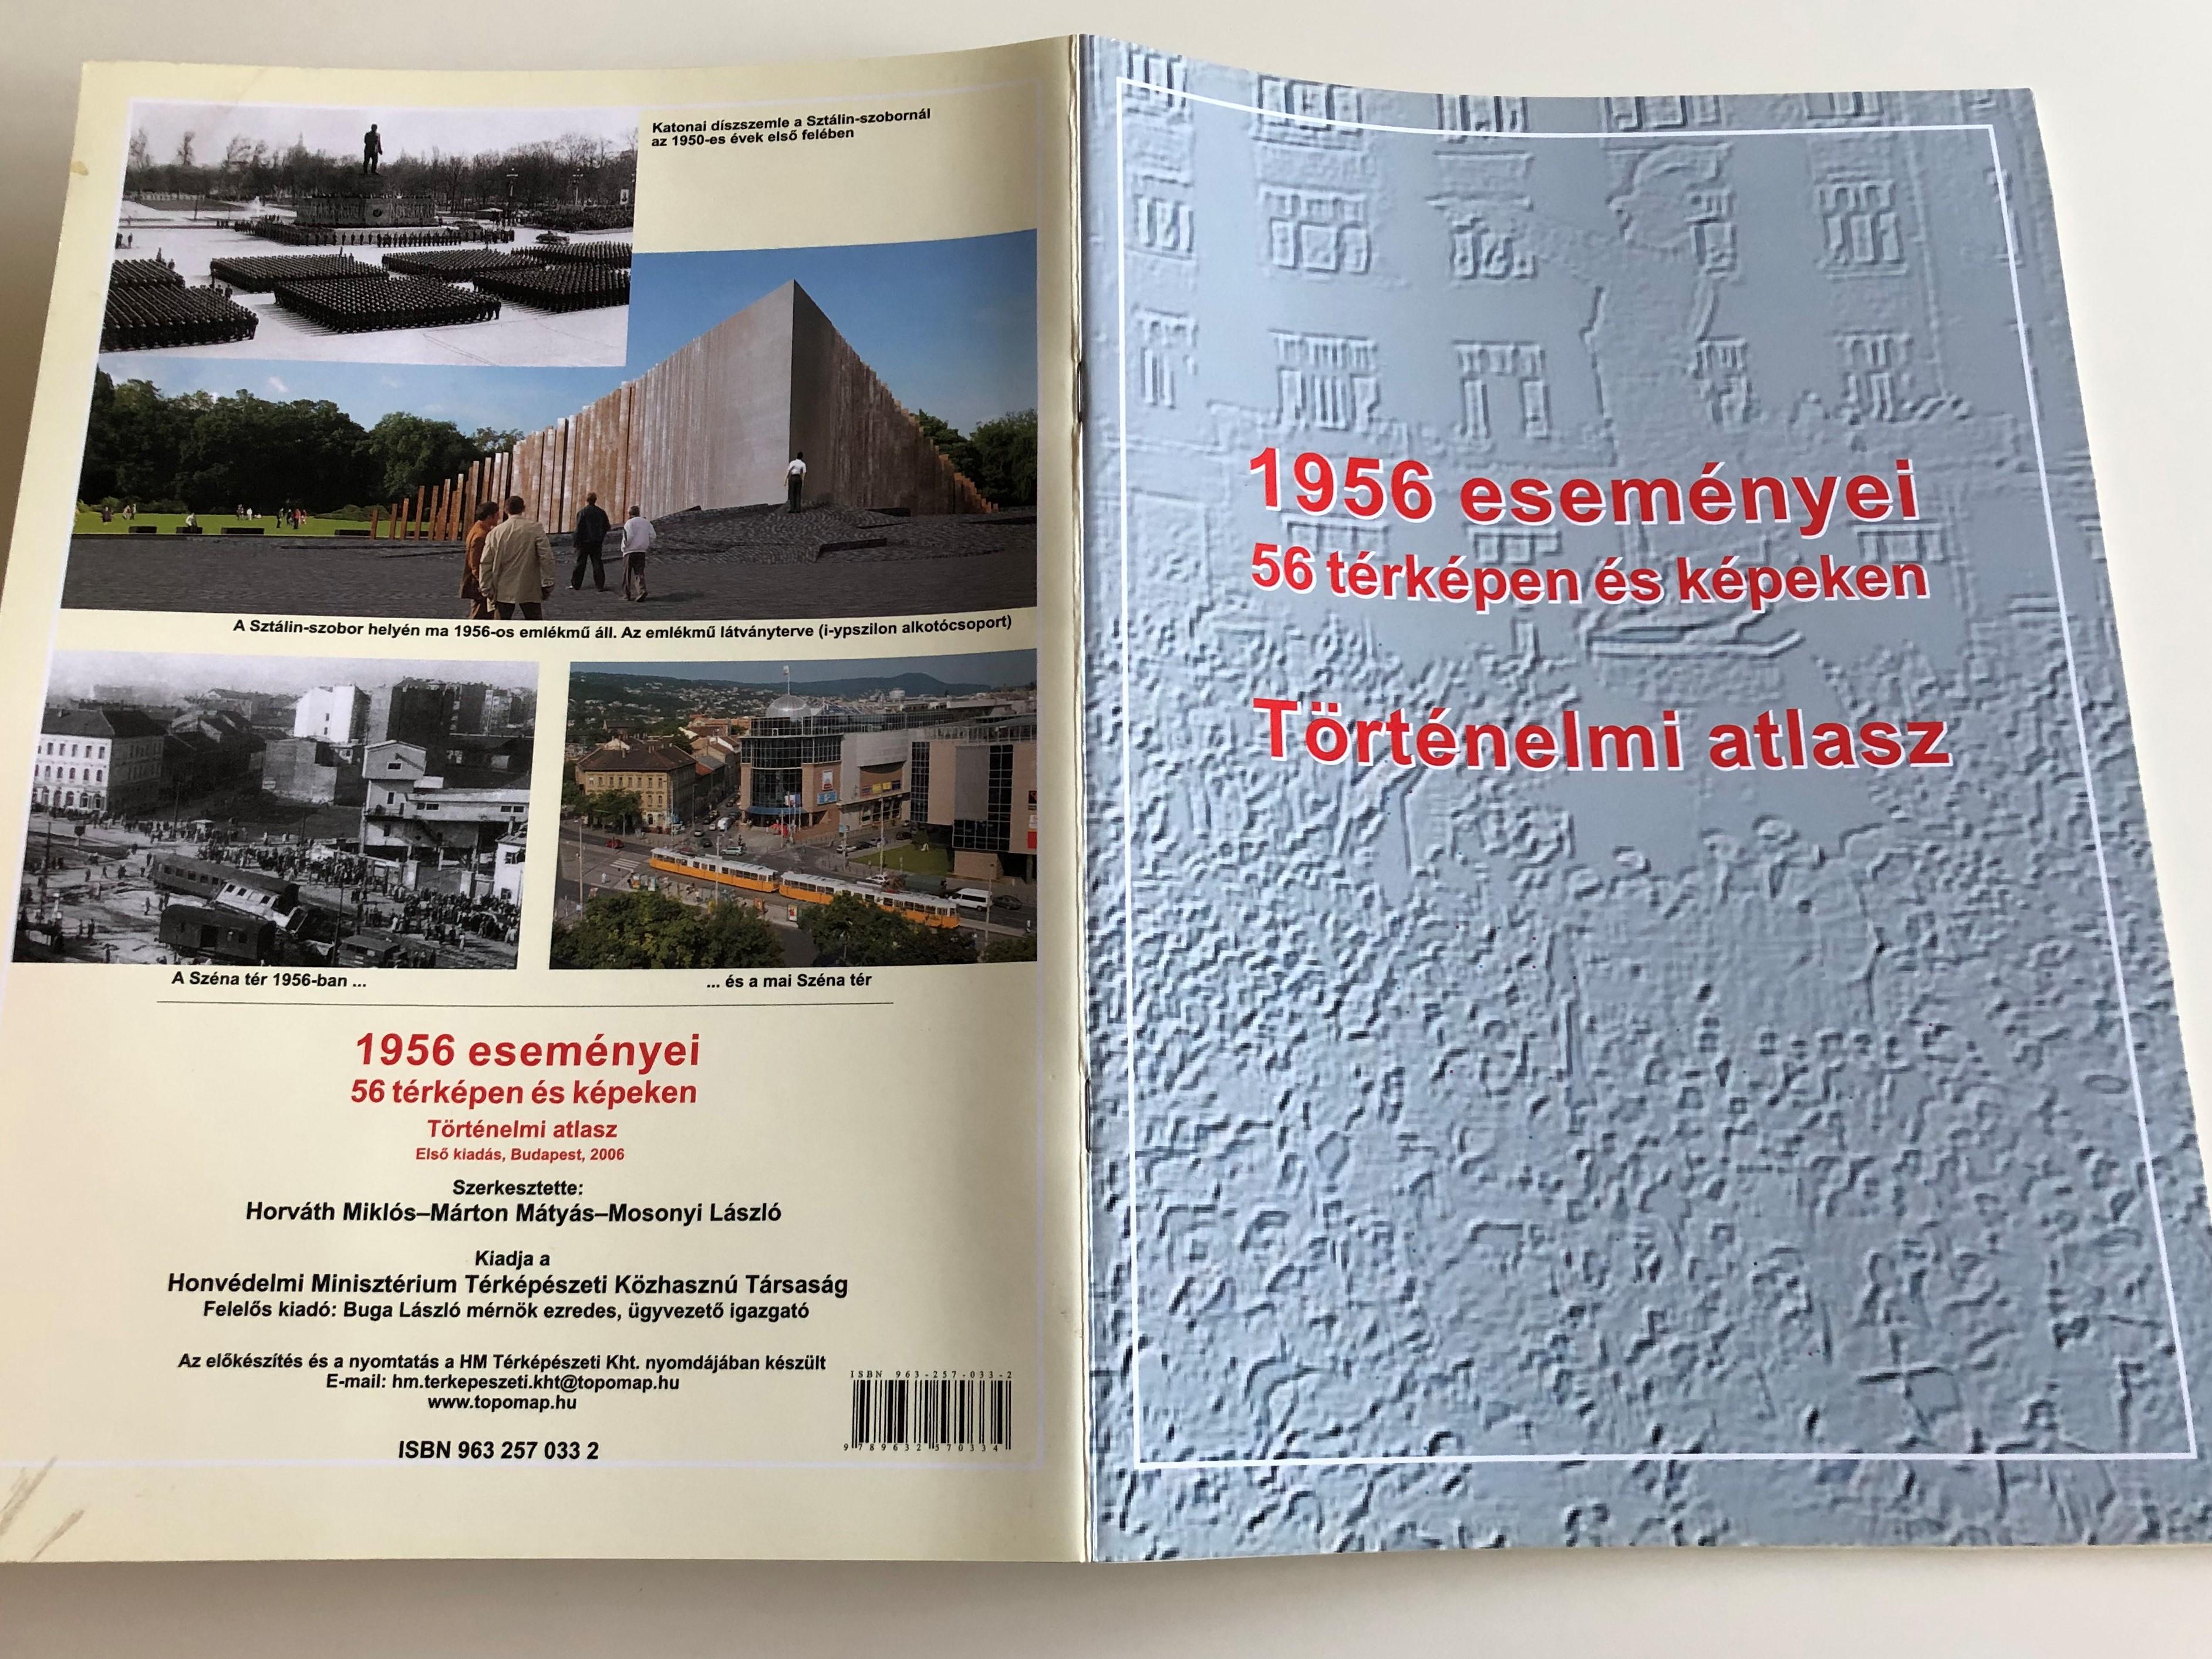 1956-esem-nyei-56-t-rk-peken-s-k-peken-t-rt-nelmi-atlas-the-events-of-1956-on-maps-and-photos-historical-atlas-2006-14-.jpg